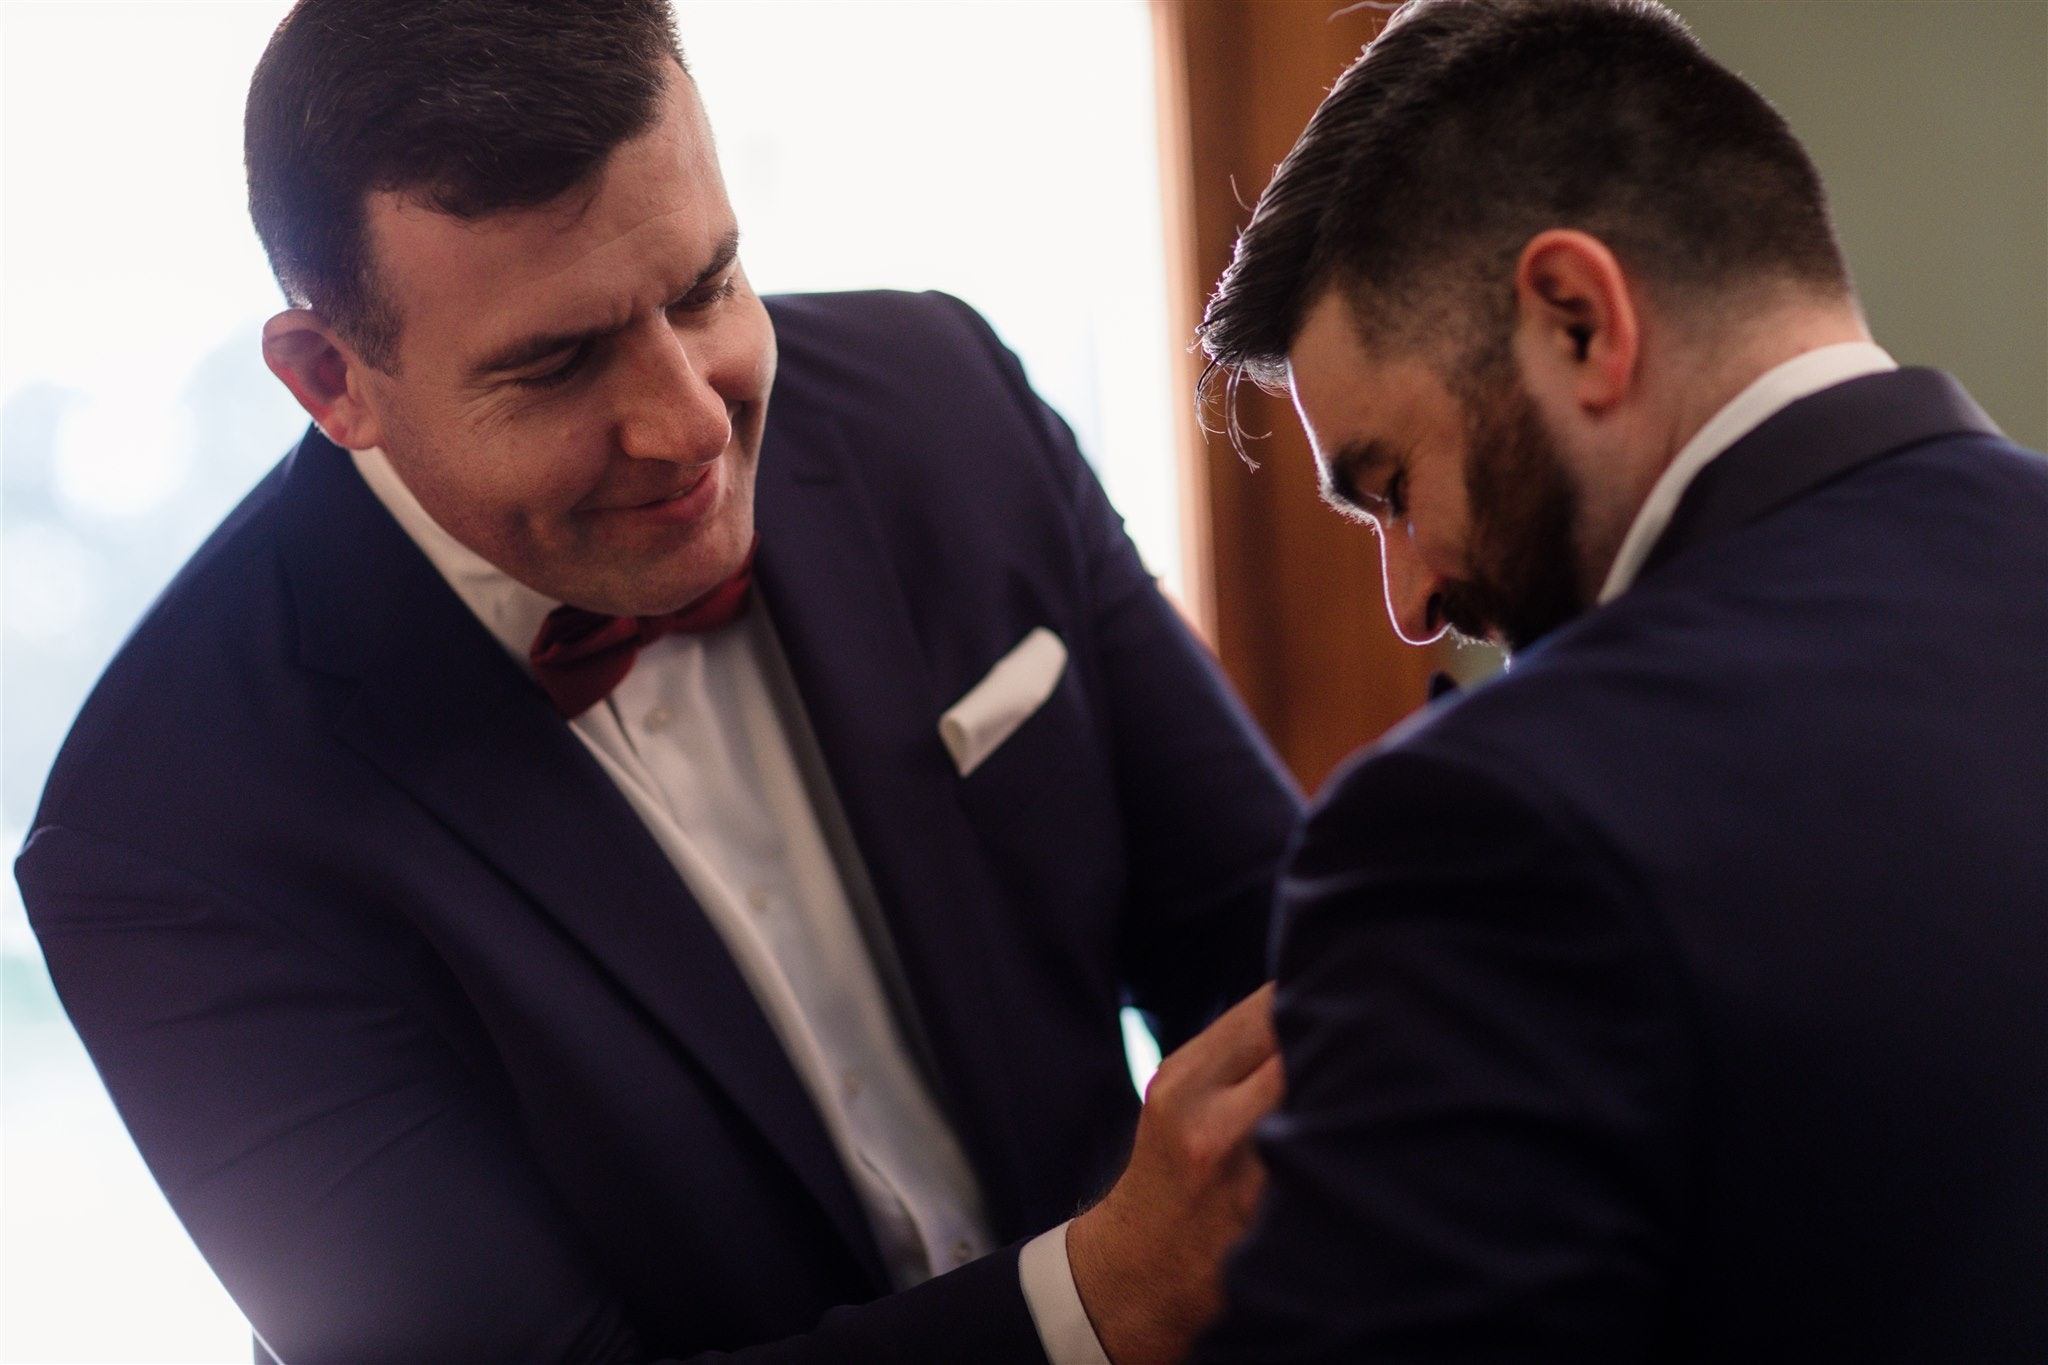 Groomsman pinning flower onto groom's jacket